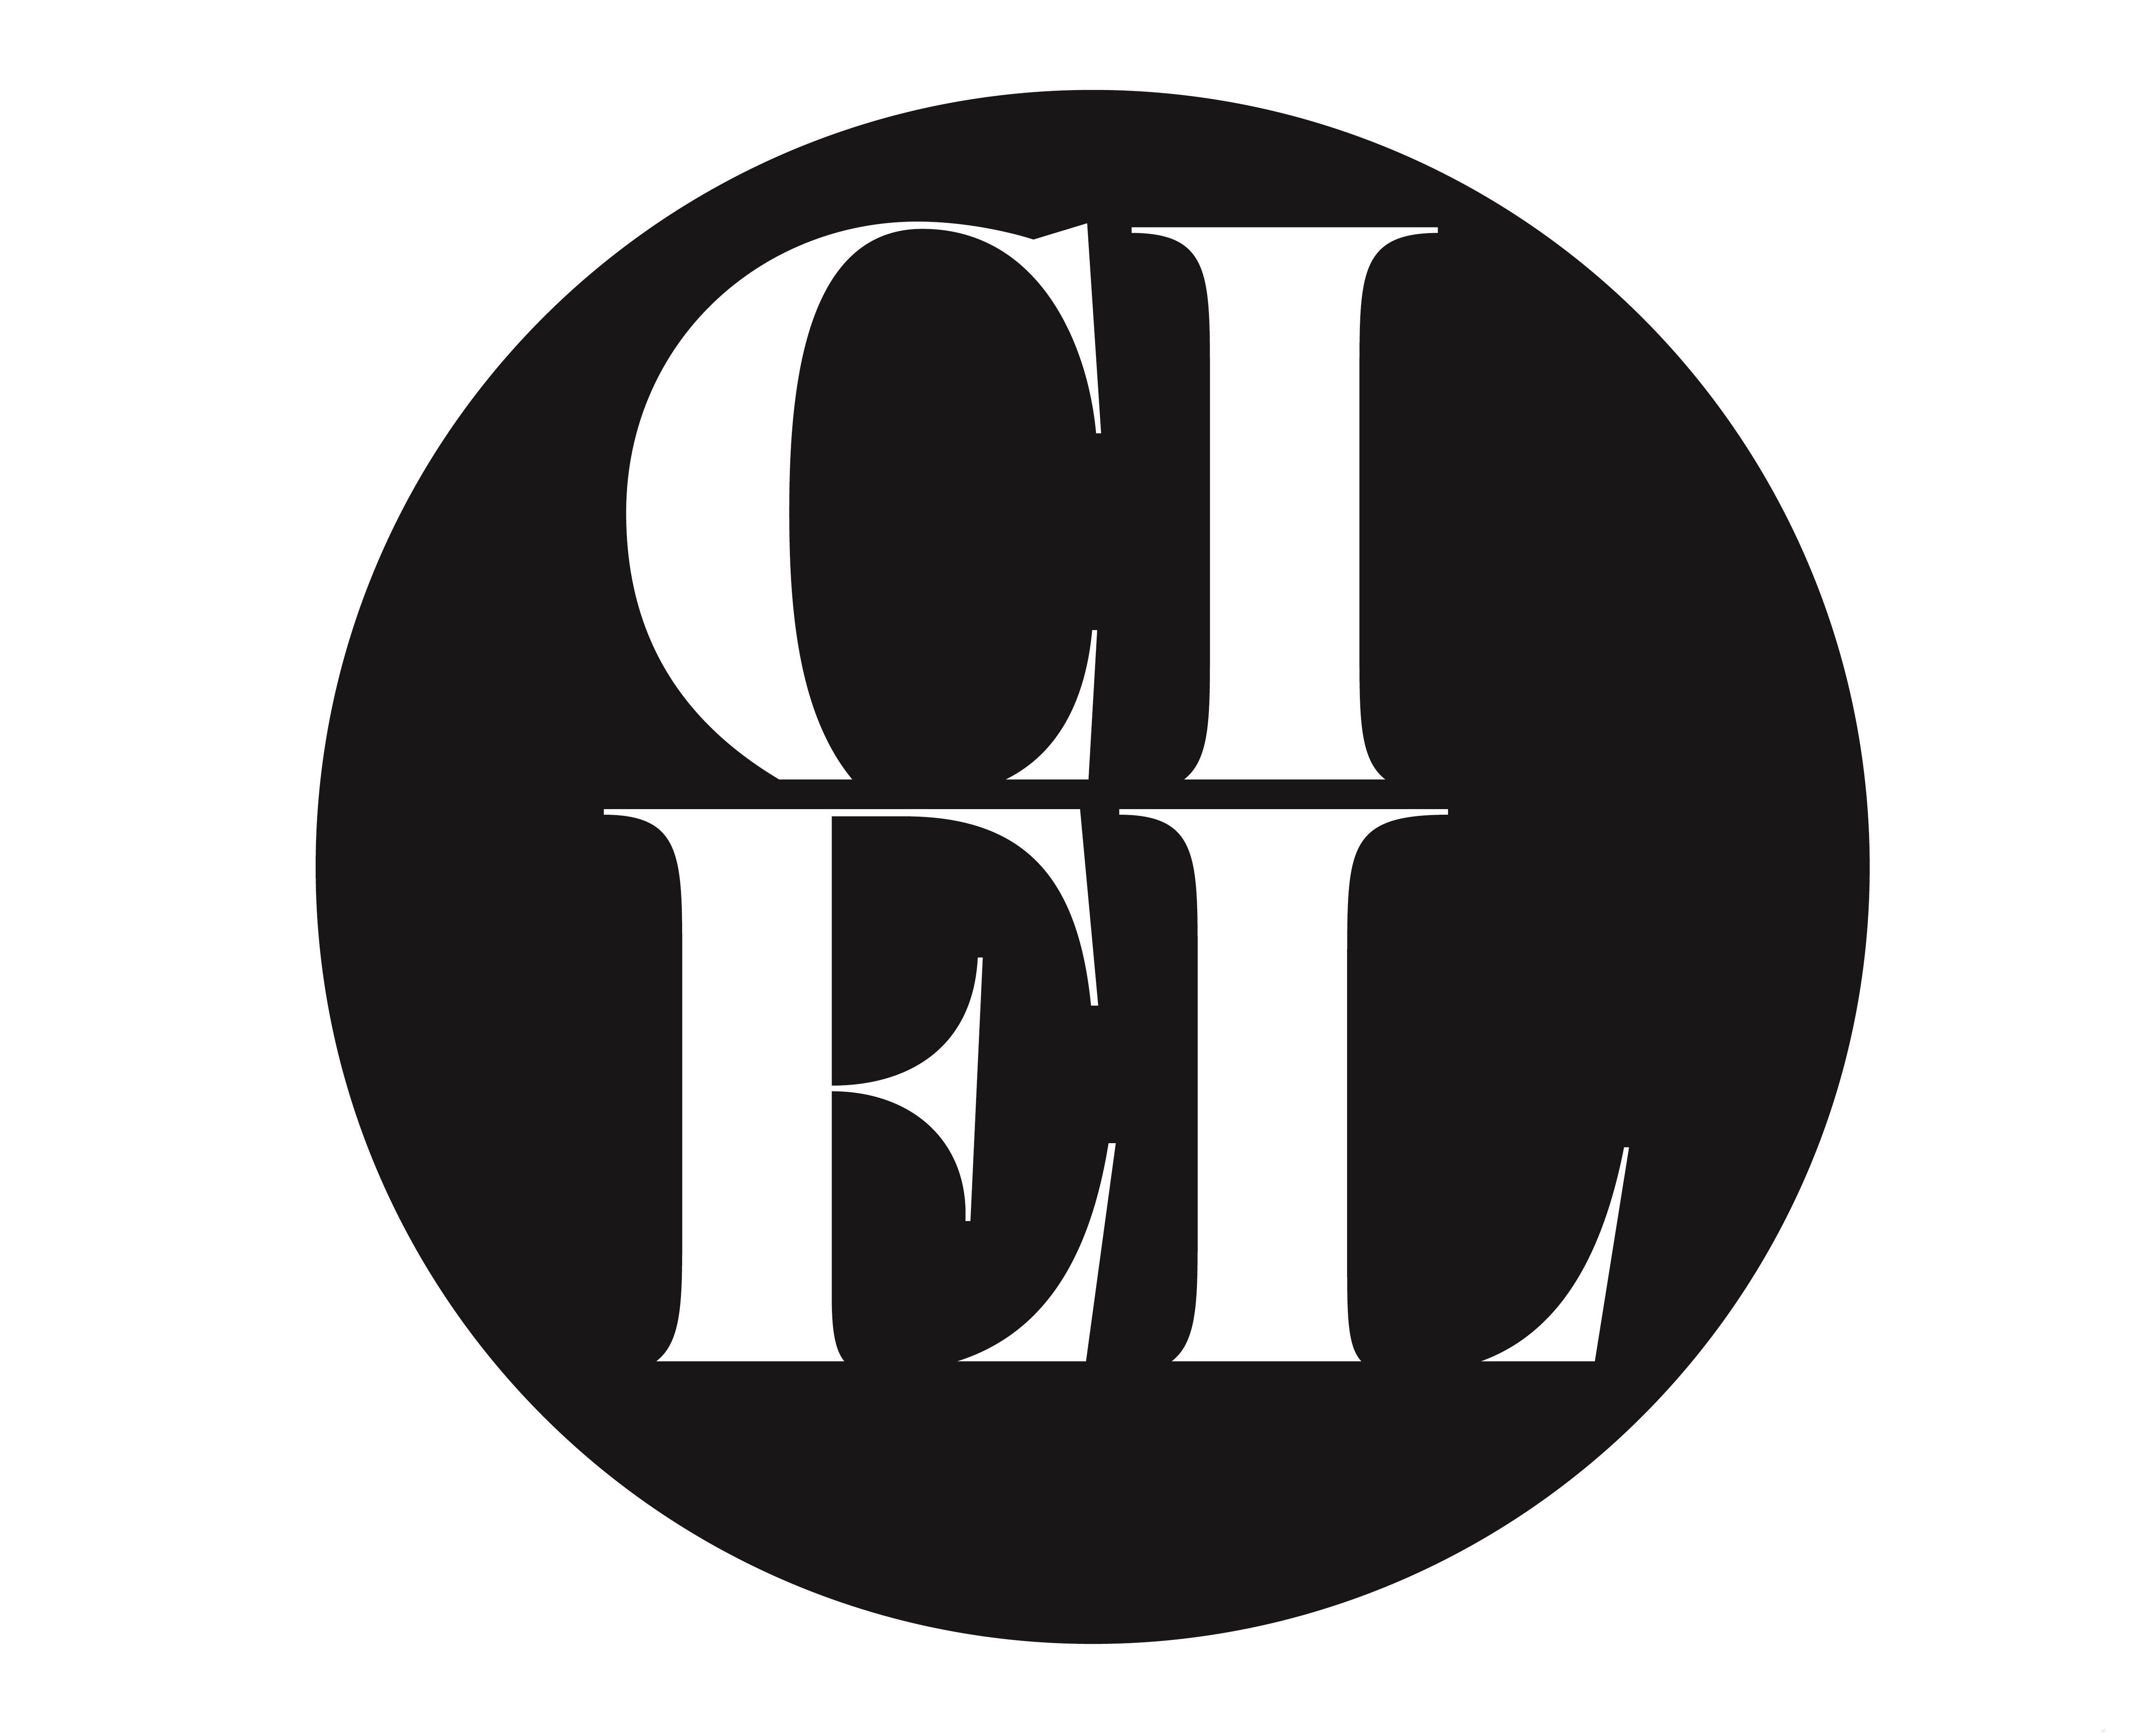 Logo of CIEL CREATIVE SPACE